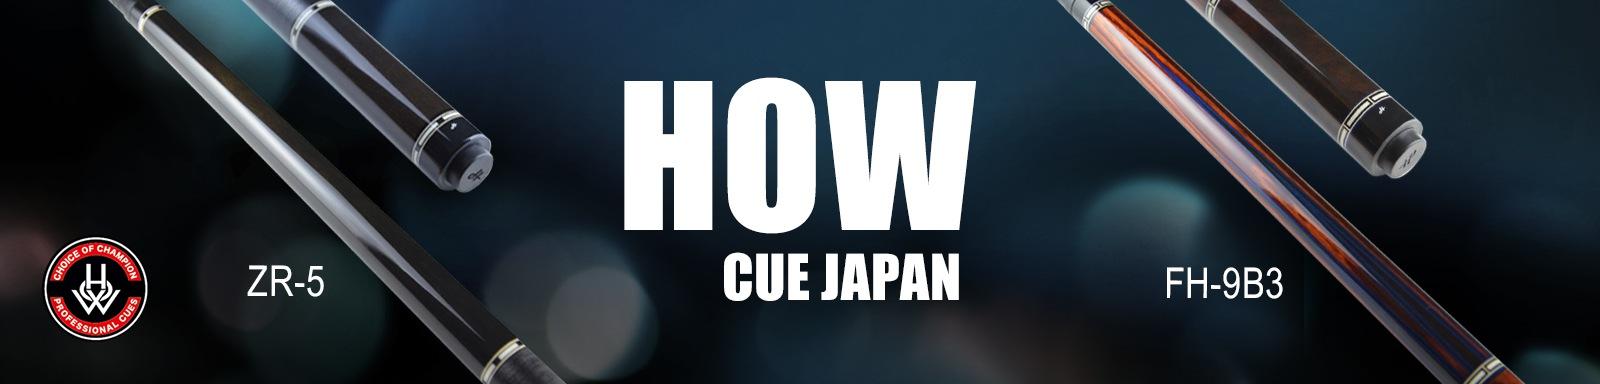 HOW CUE